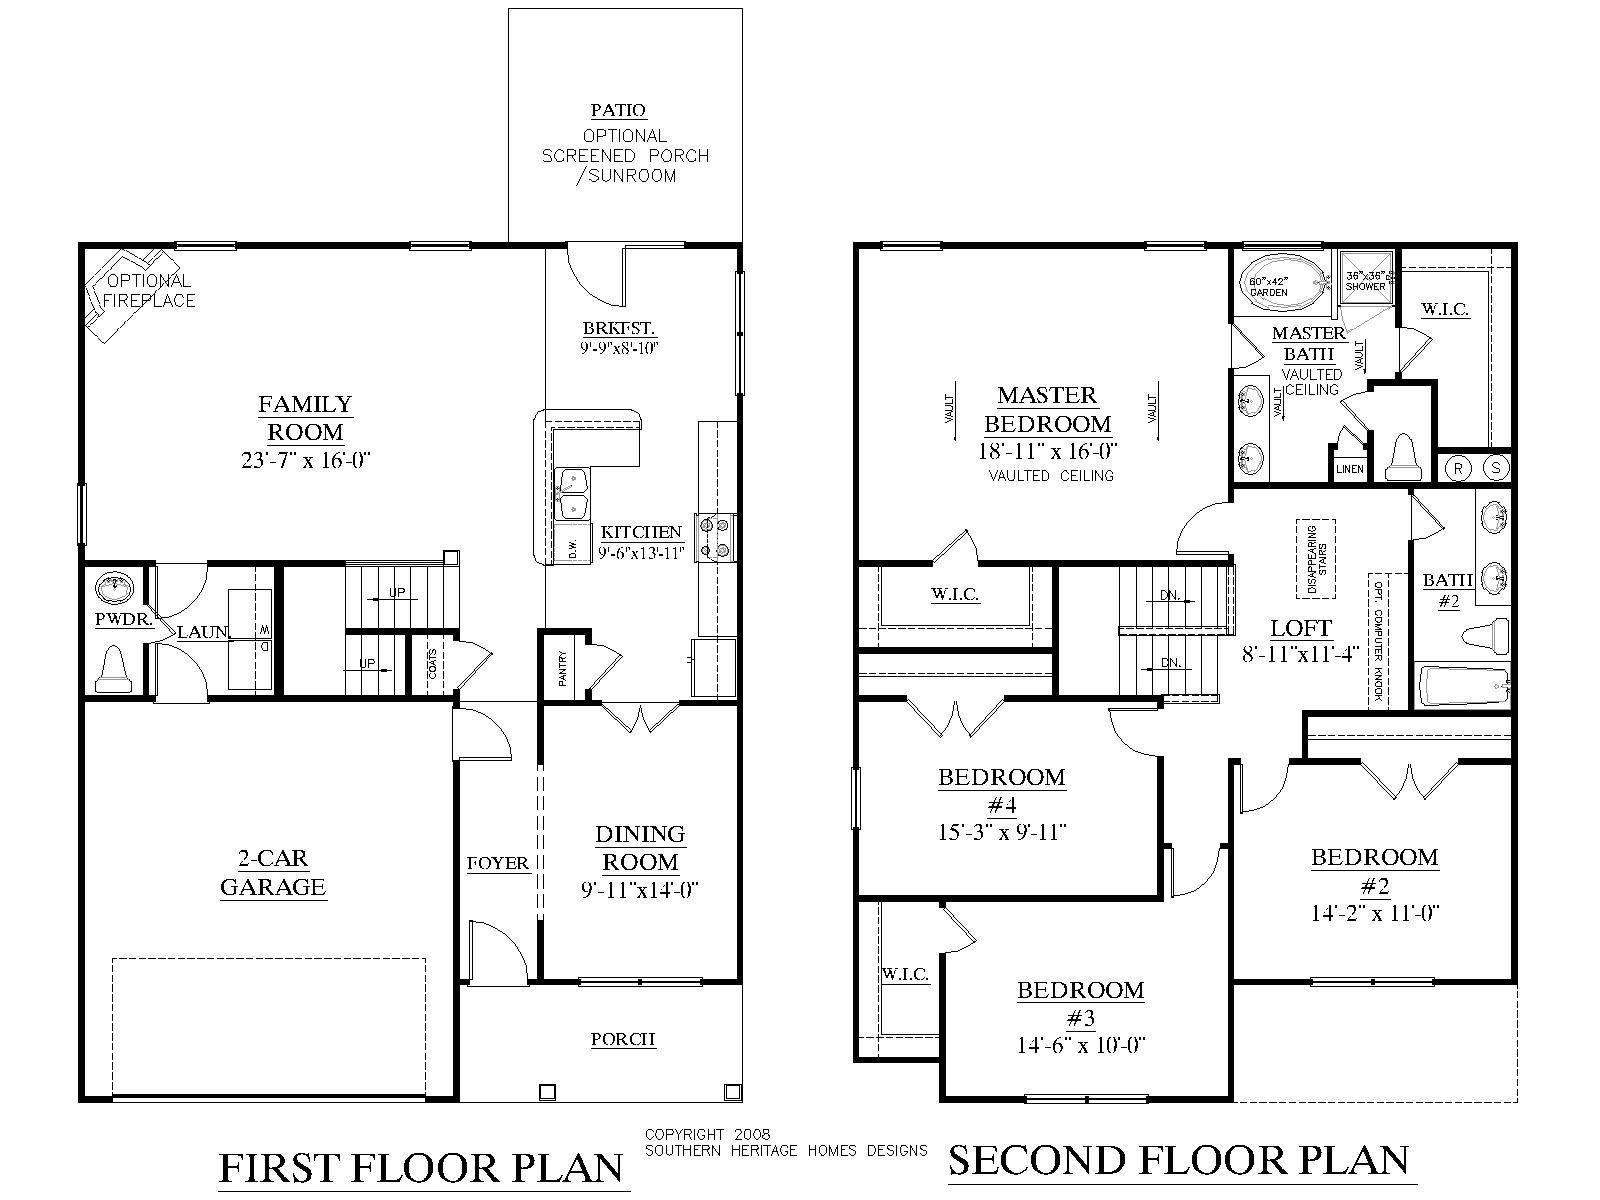 House Plan 2356 Laurens plan 2353 Square Feet 34'0